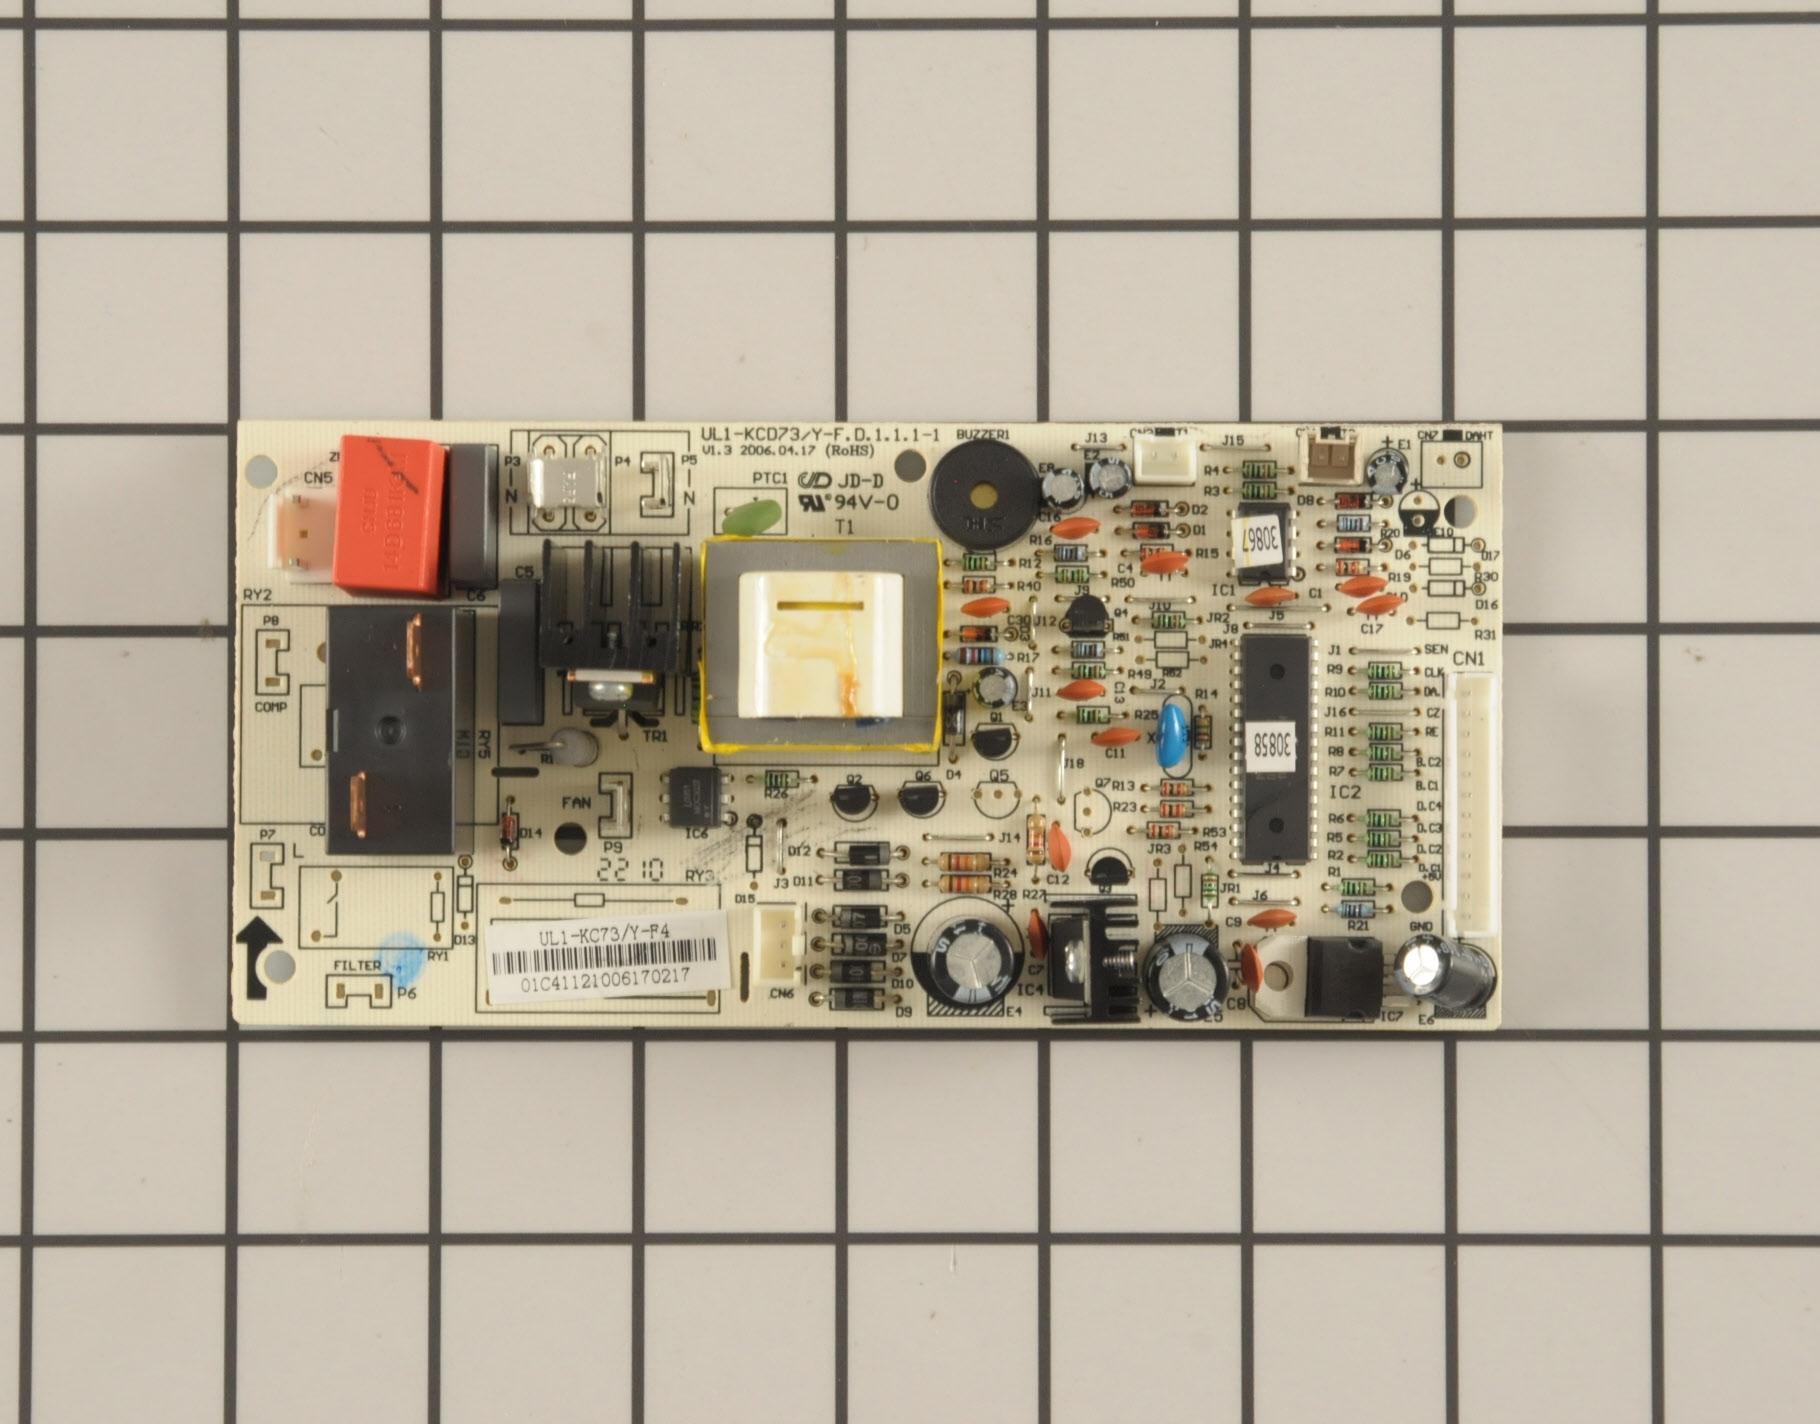 Frigidaire Air Conditioner Part # 5304455487 - Main Control Board